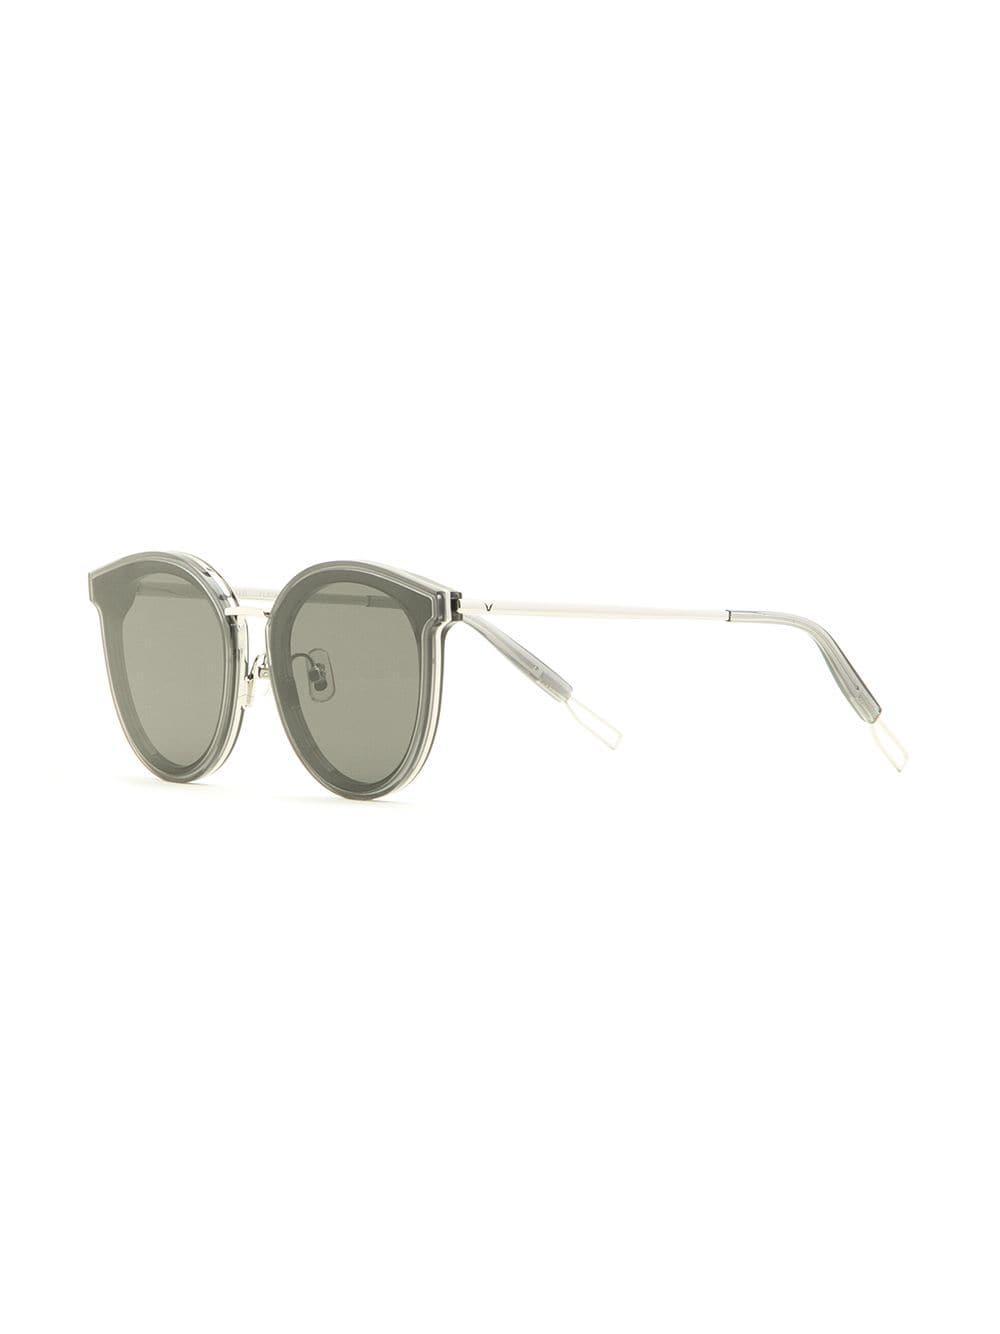 5a3b49f226f Gentle Monster Merlynn Round-frame Sunglasses in Gray - Lyst